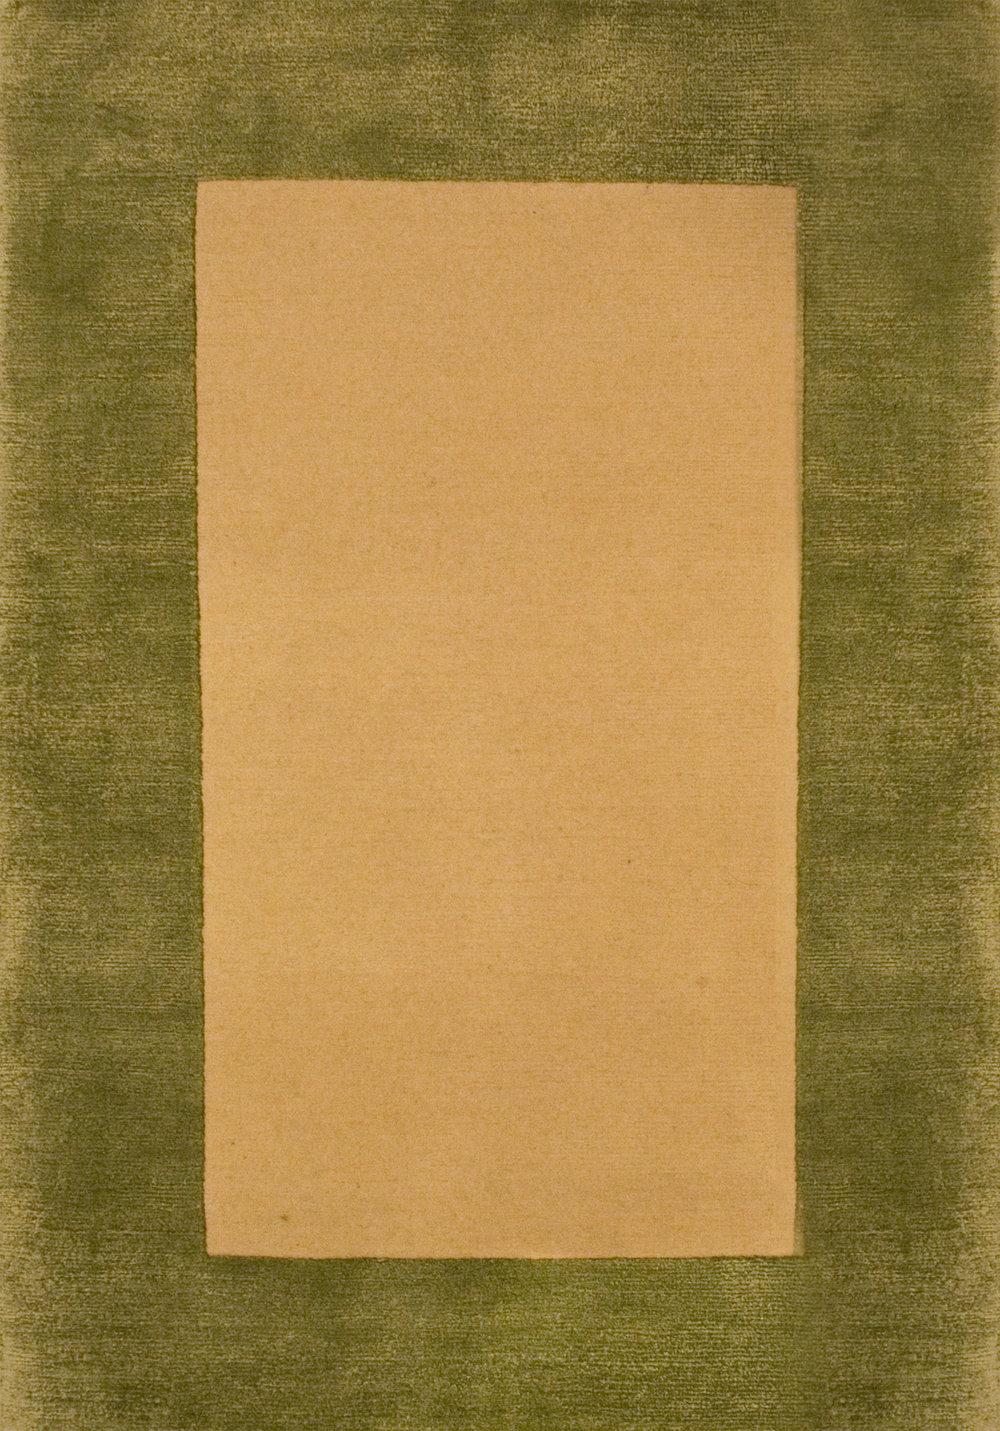 Mossy Green Rug.jpg